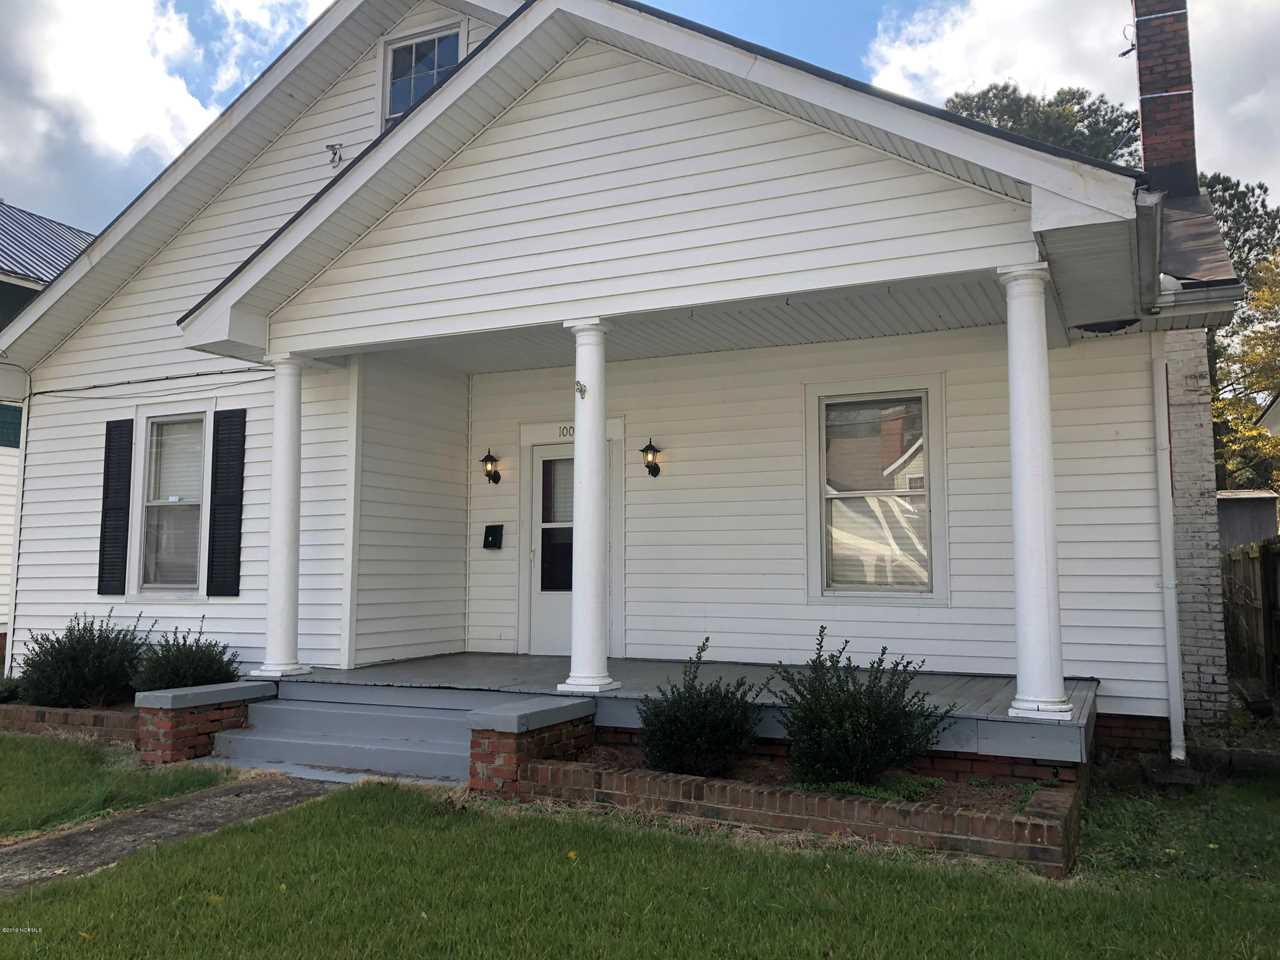 1005 Anderson Street Wilson, NC 27893 | MLS 100145756 Photo 1